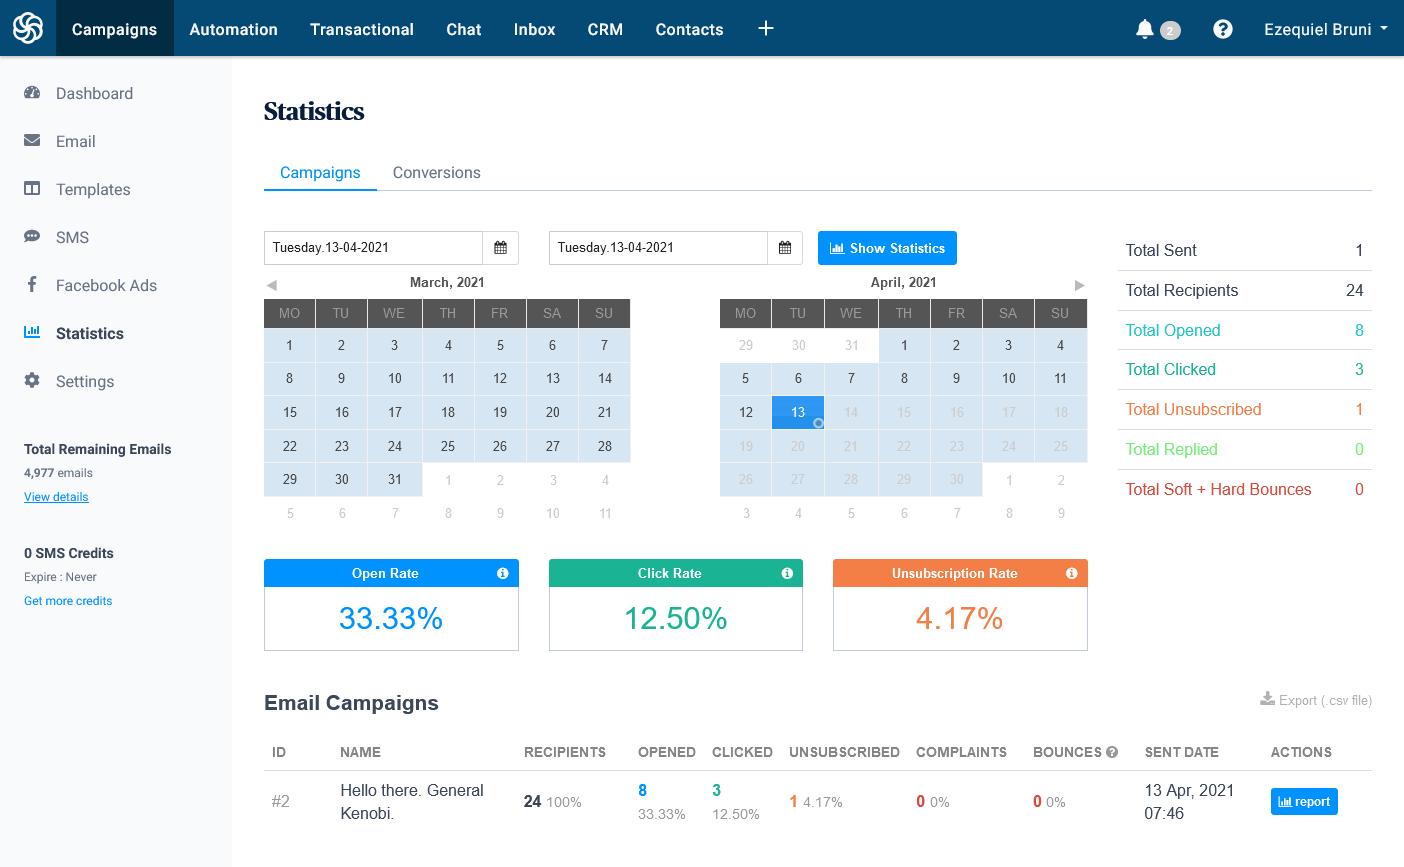 The statistics dashboard